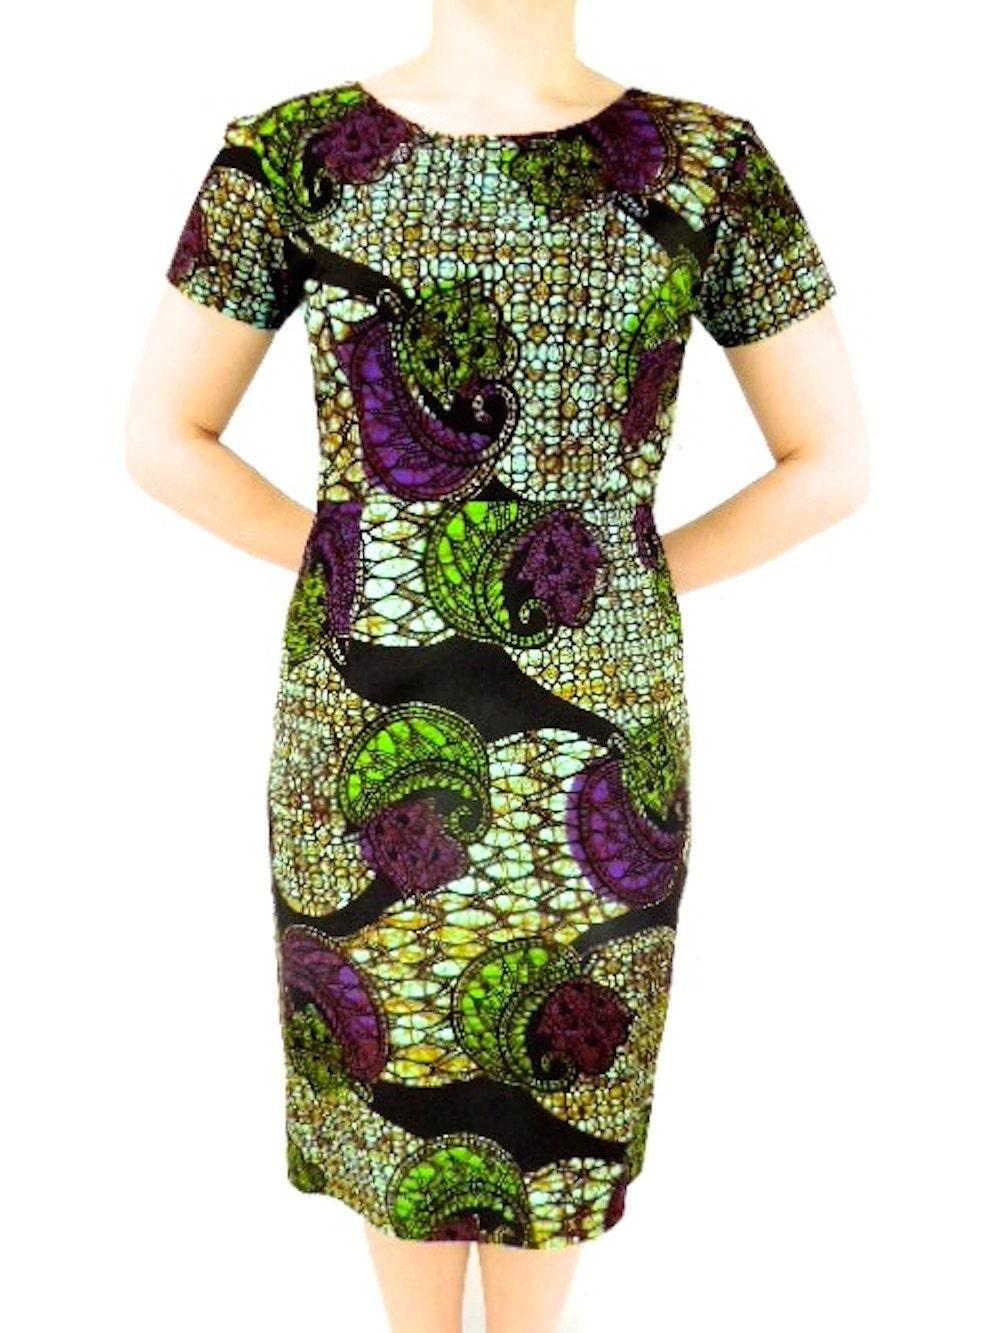 Africa Print Dress Africa Dress Ankara Dress Africa Clothing Knee Length Fitted Women Wedding Outfit